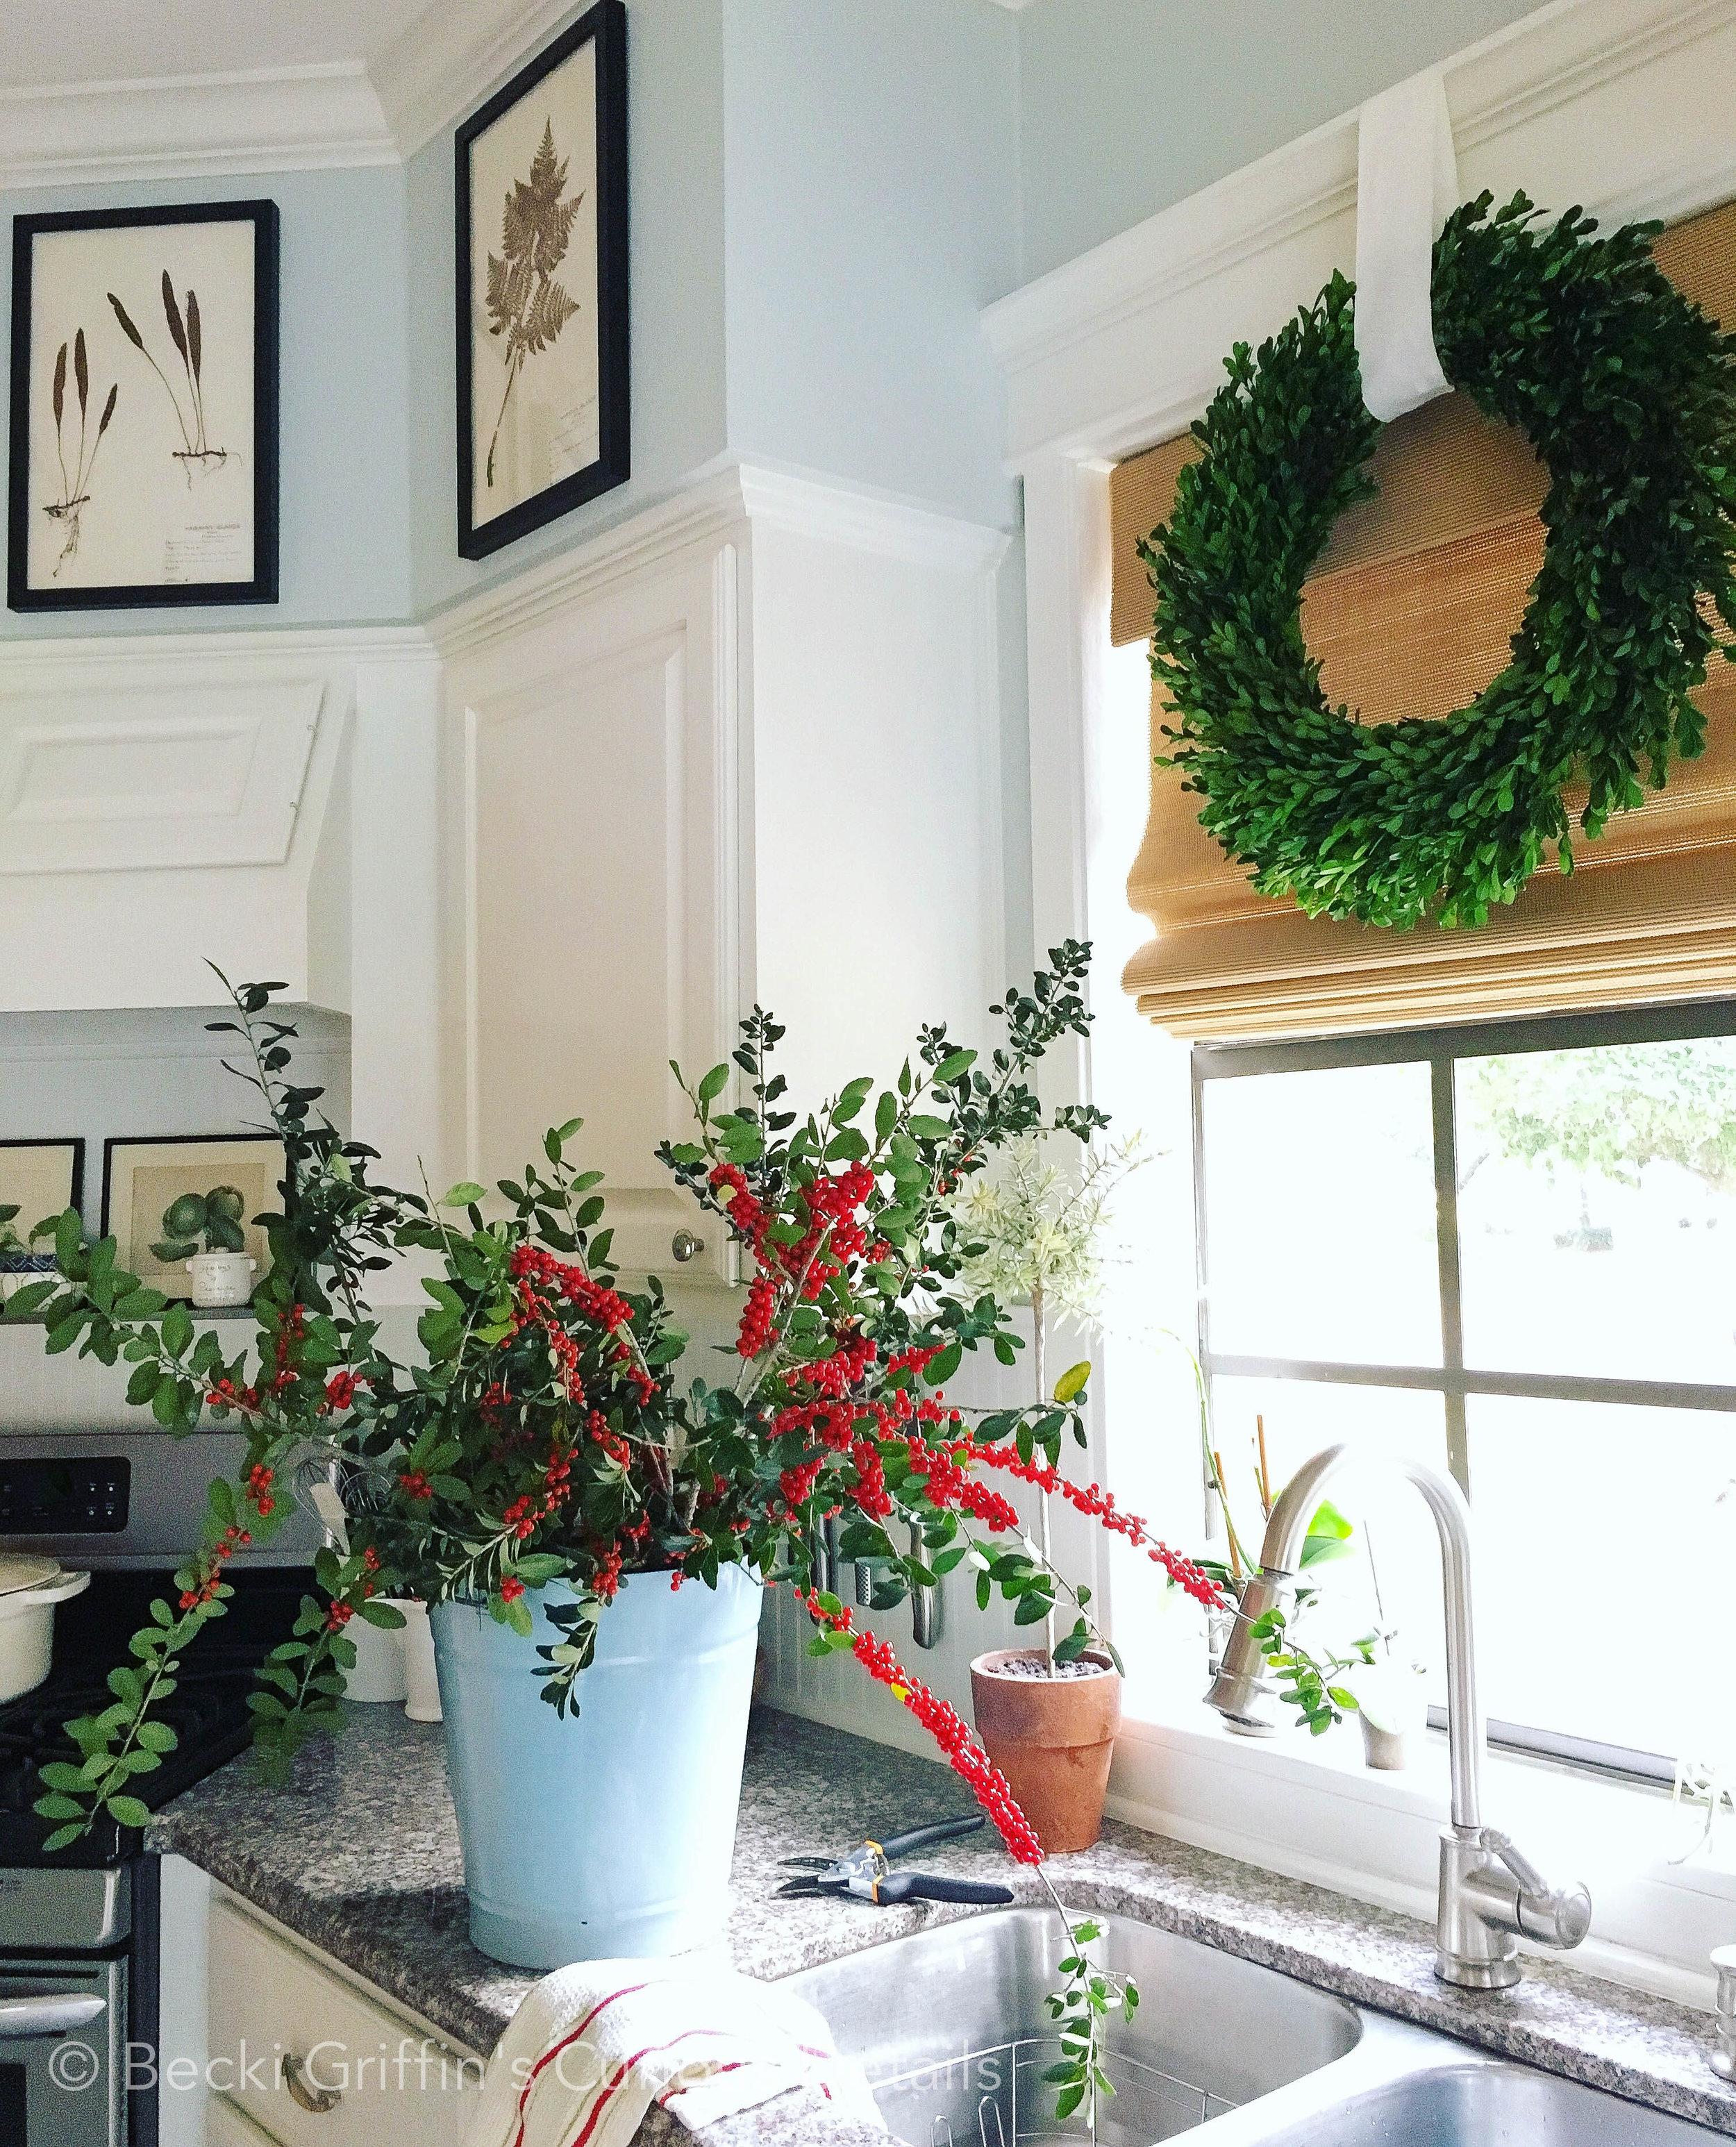 Becki Griffin's Curious Details Christmas Berries-1.jpg